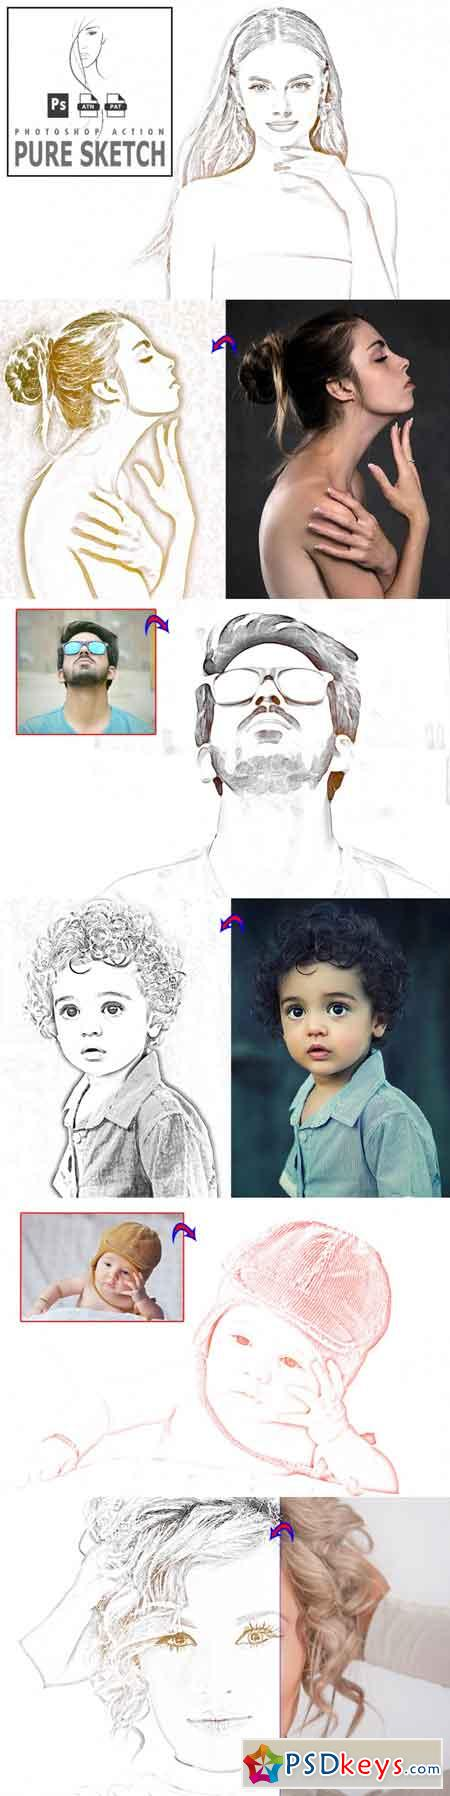 Pure Sketch Photoshop Action 3513122